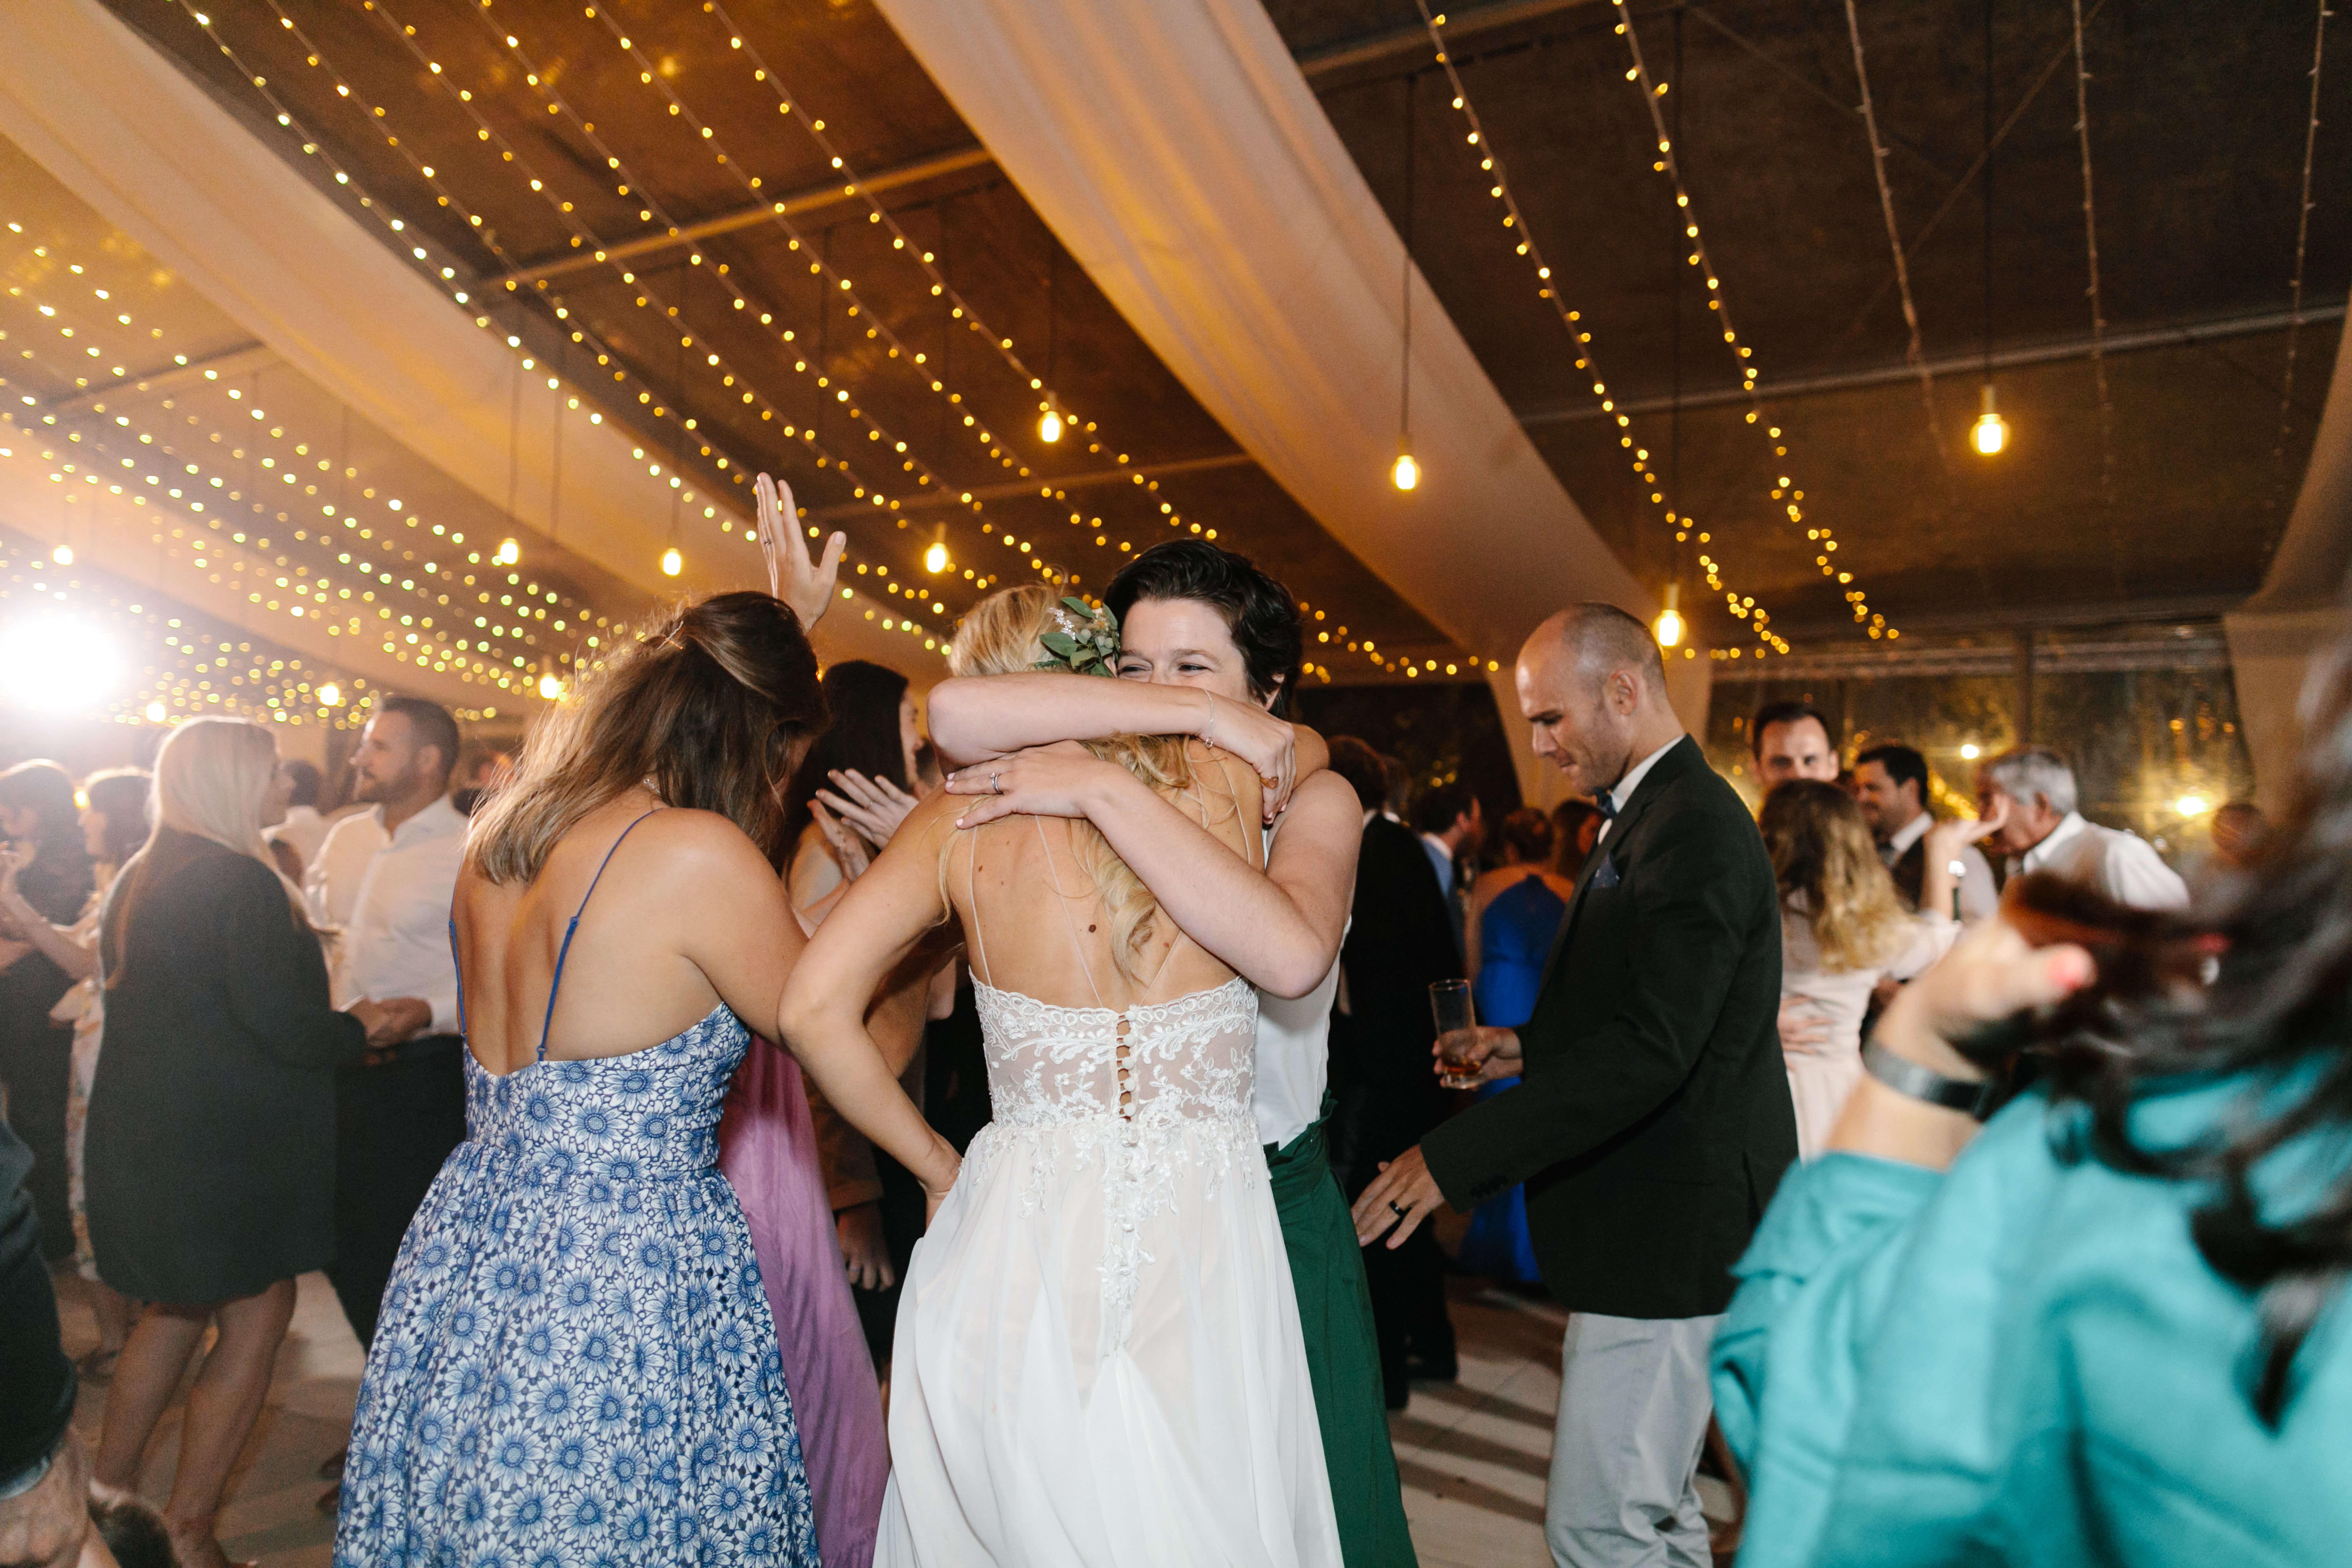 A friend hugging a blonde bride on her wedding night.